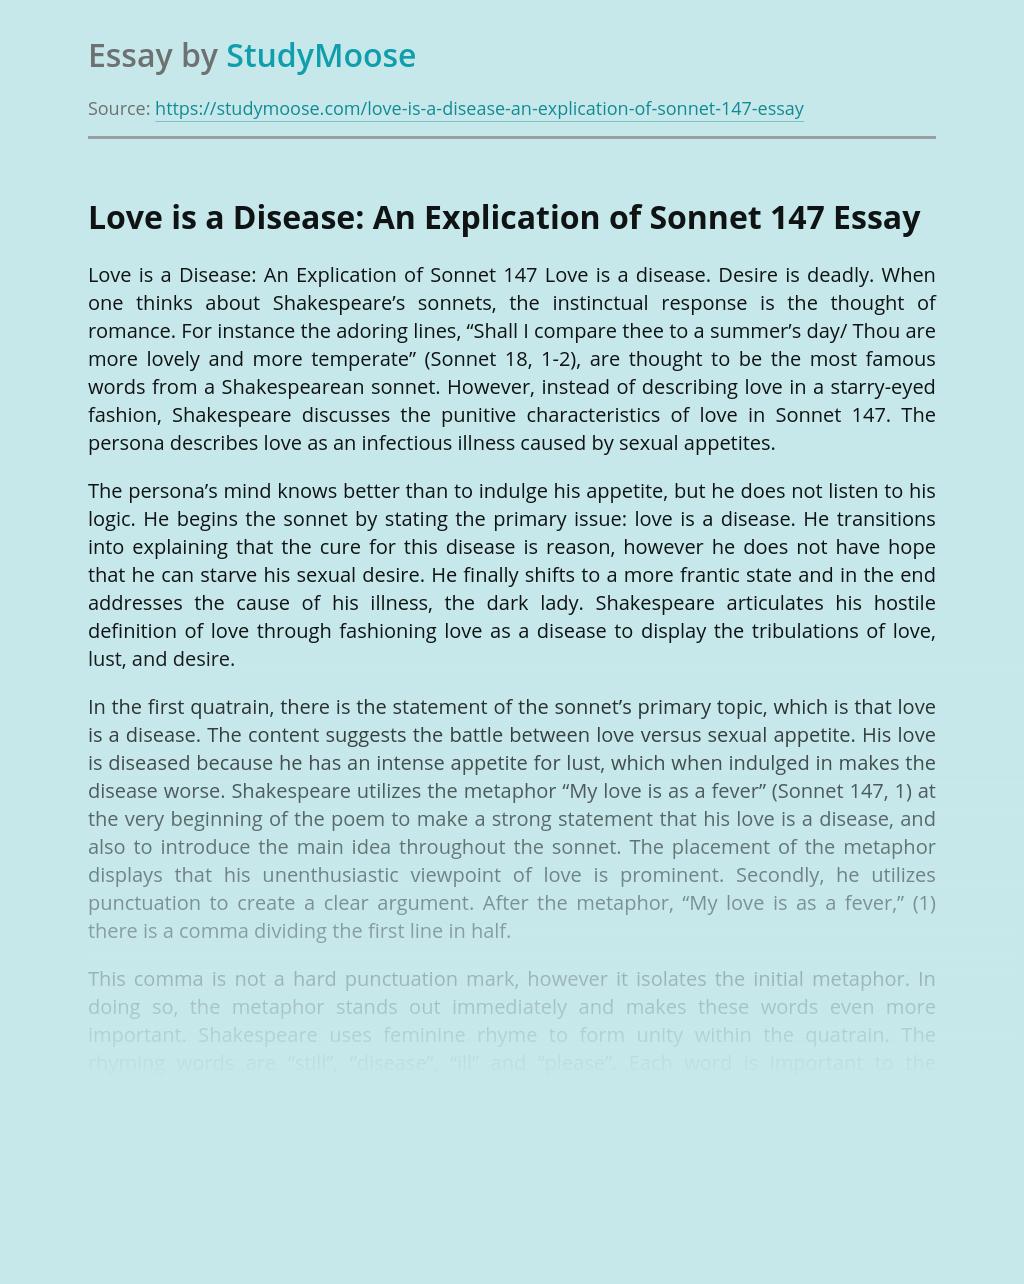 Love is a Disease: An Explication of Sonnet 147